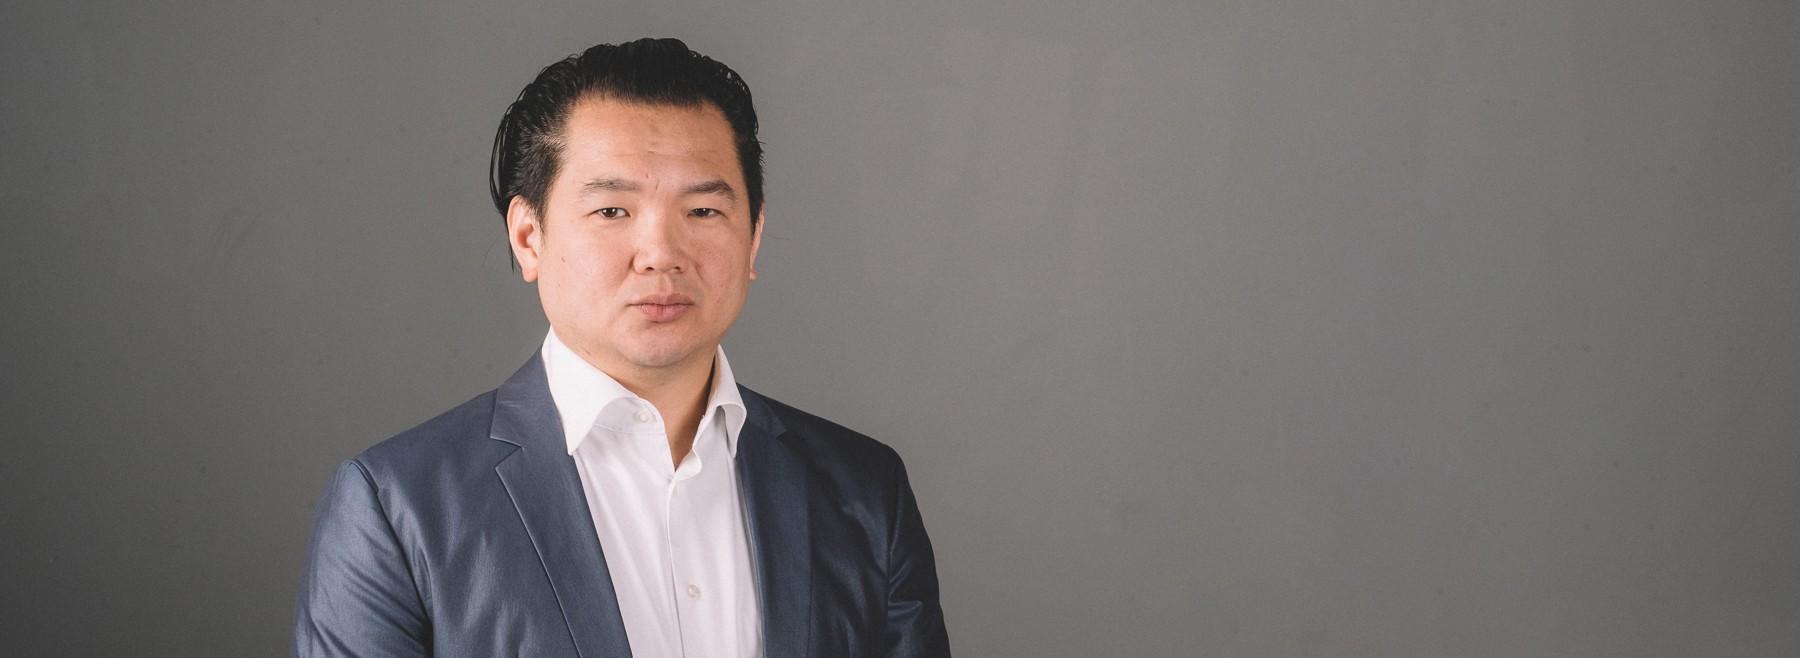 Cheung Steuerberater - Über uns